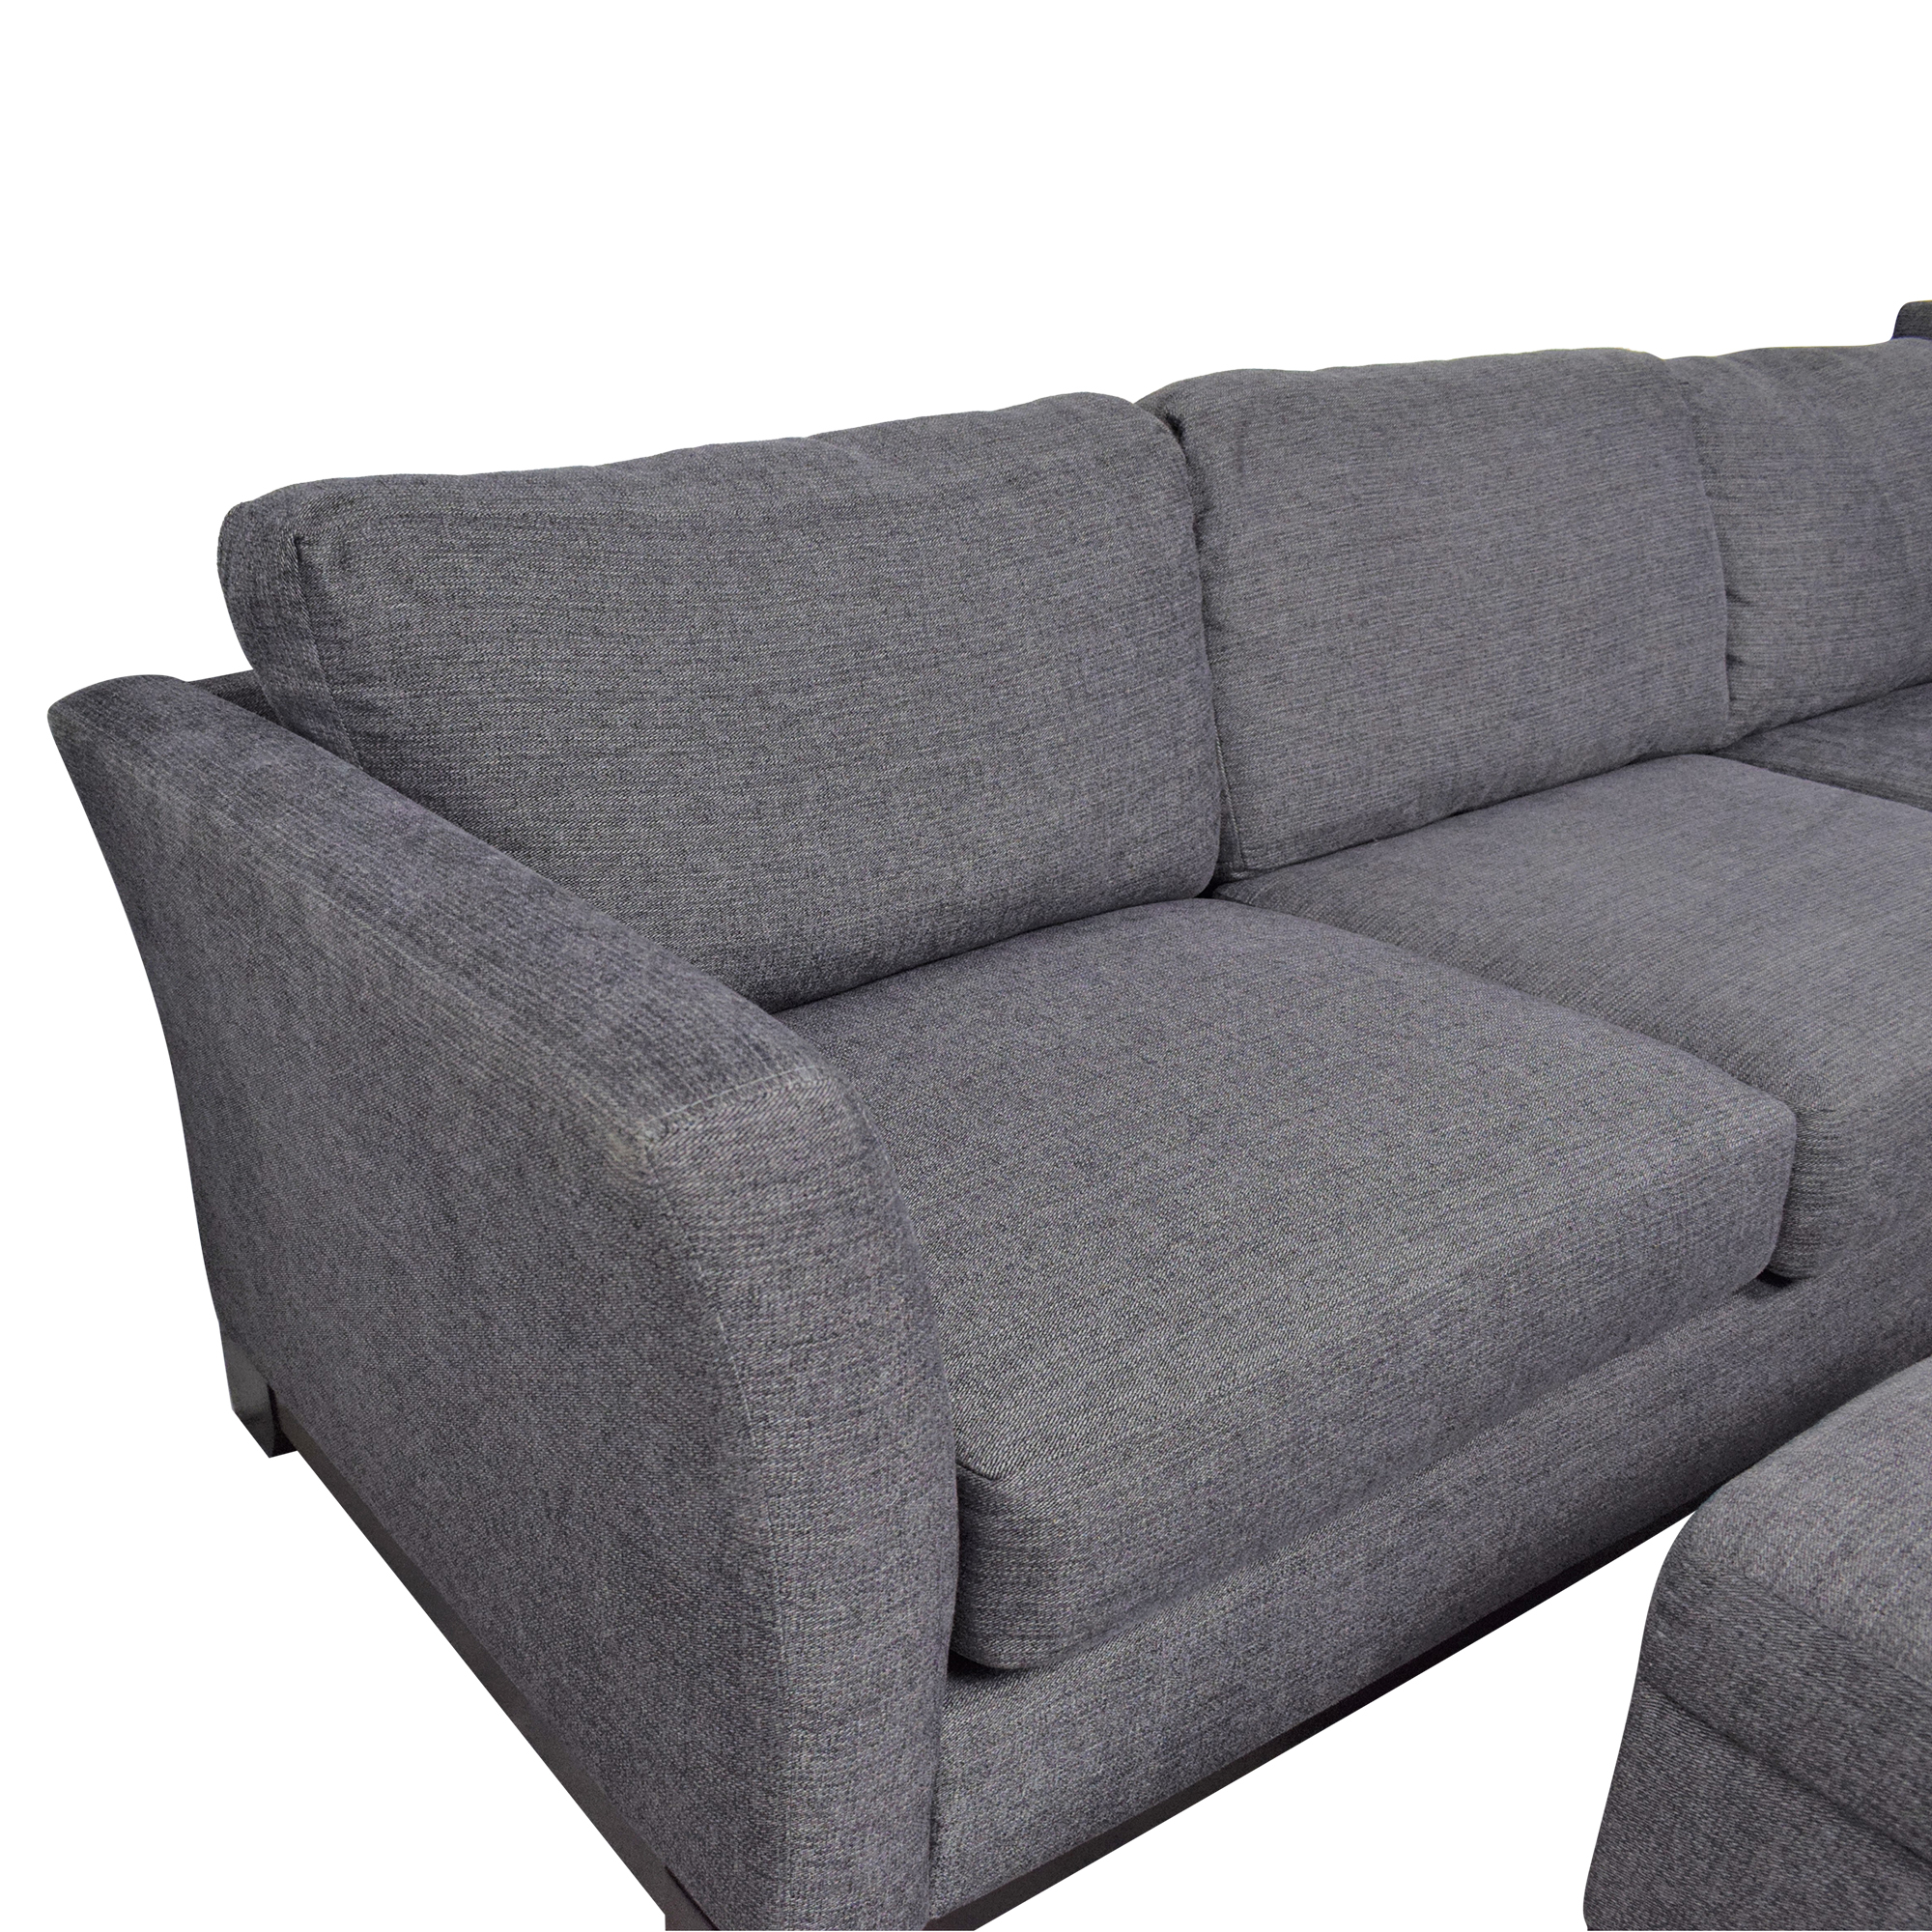 buy Jonathan Louis Elliot II Sofa with Storage Ottoman Jonathan Louis Sofas